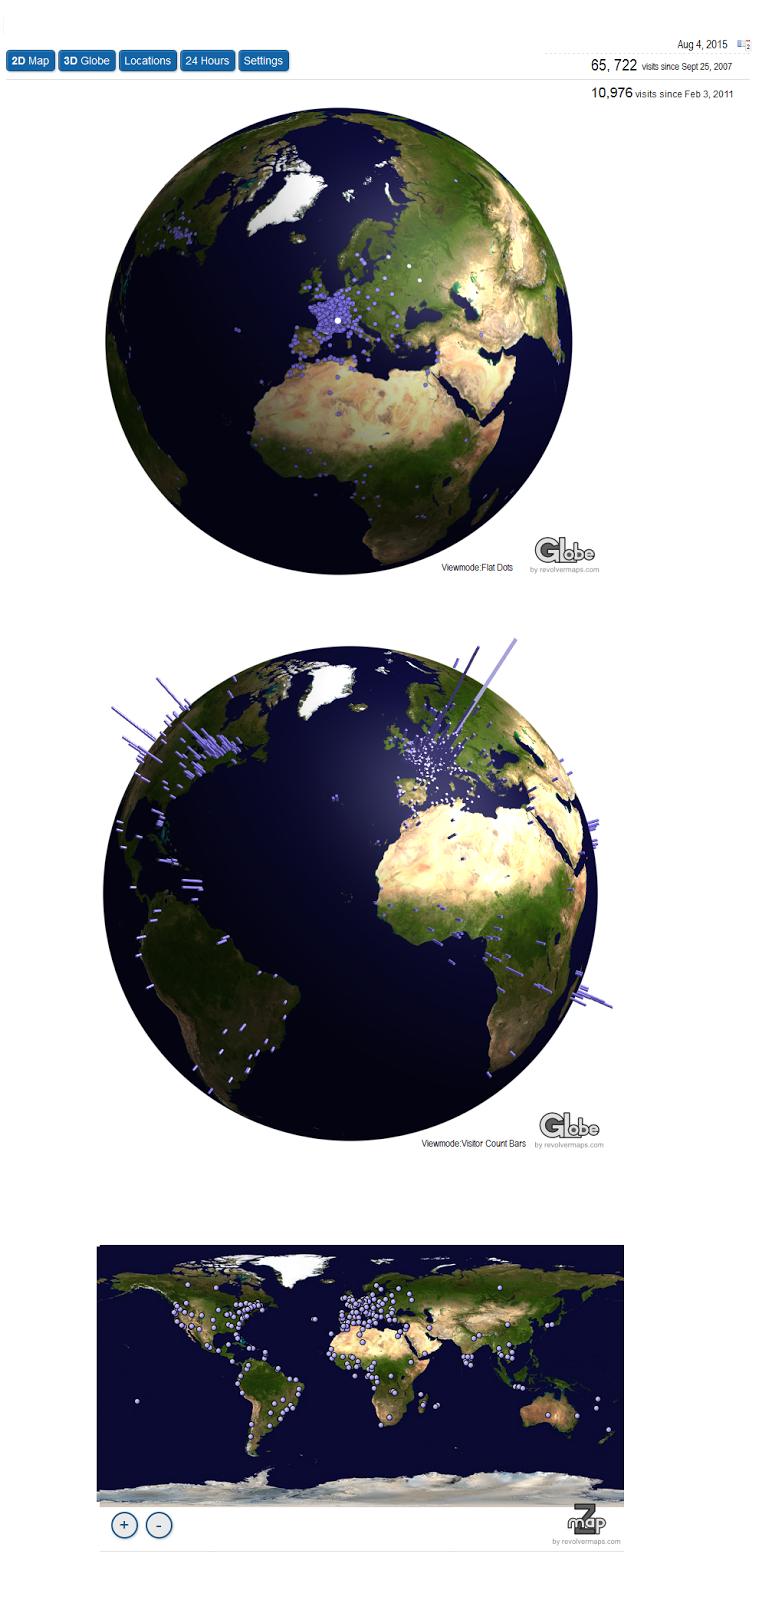 http://www.revolvermaps.com/?target=enlarge&i=1puscwuf0cu&color=8377f2&m=0